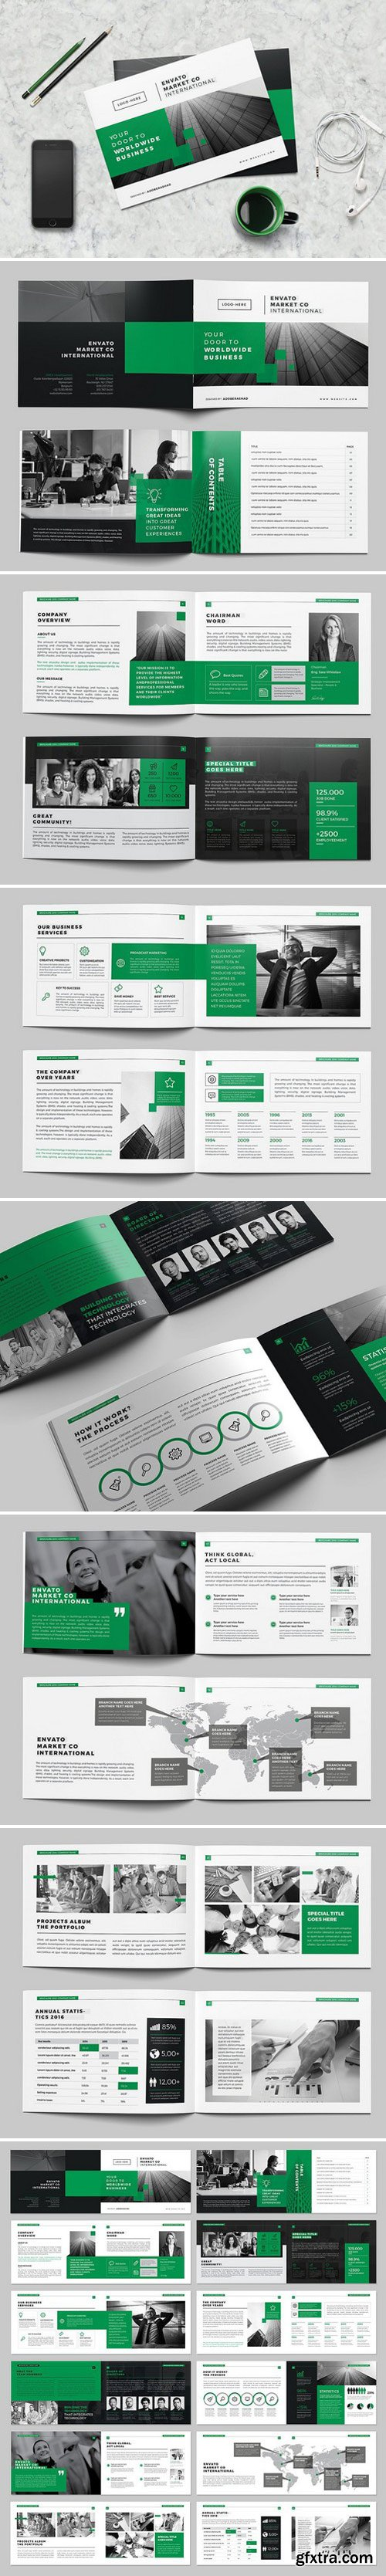 CM - A5 Landscape Company Brochure 2136370